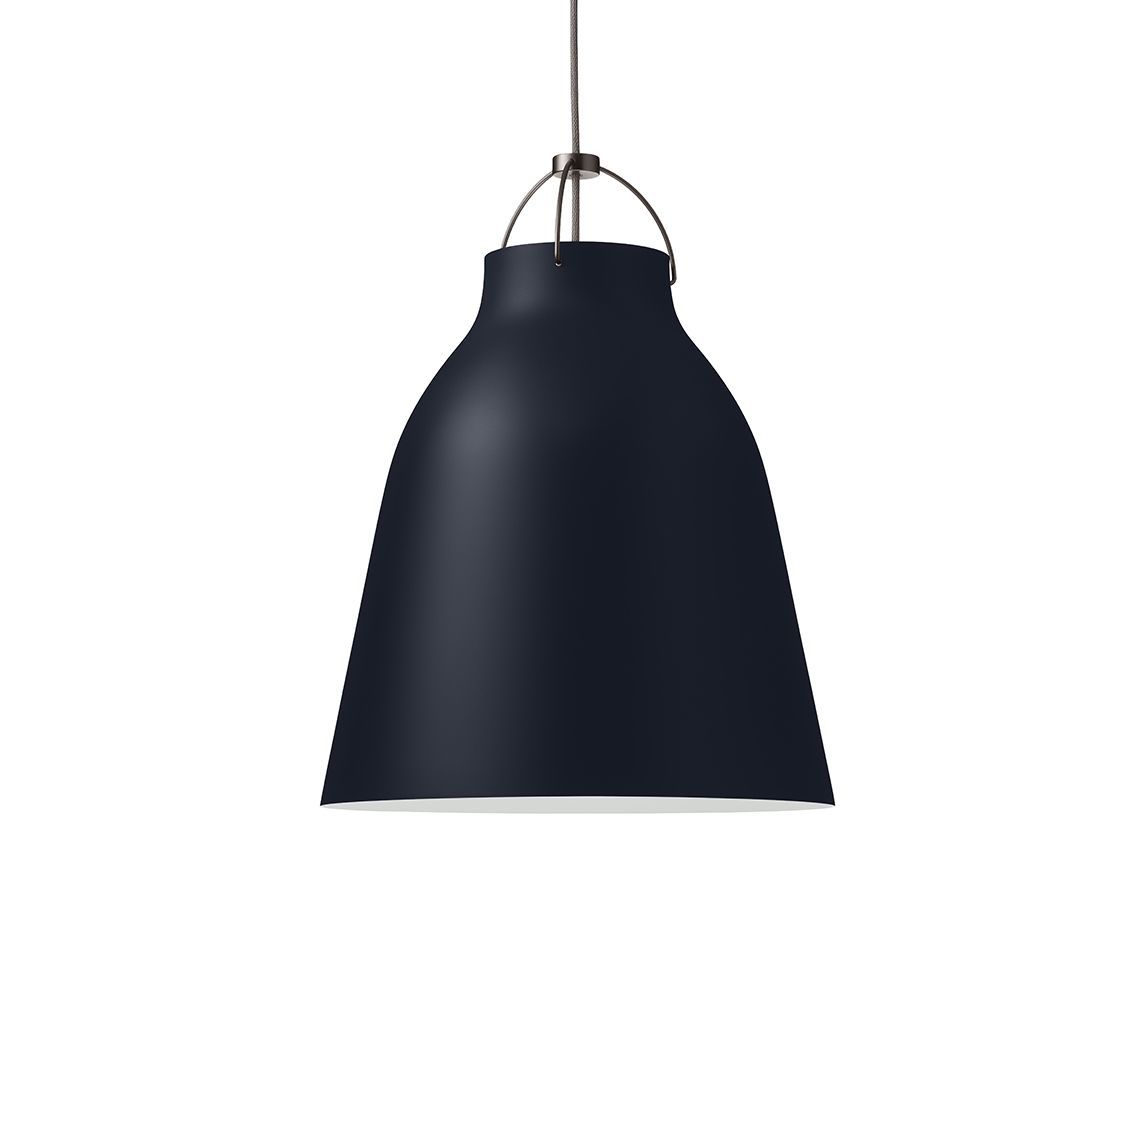 Caravaggio hanglamp Lightyears Ø16 Dark Ultramarine